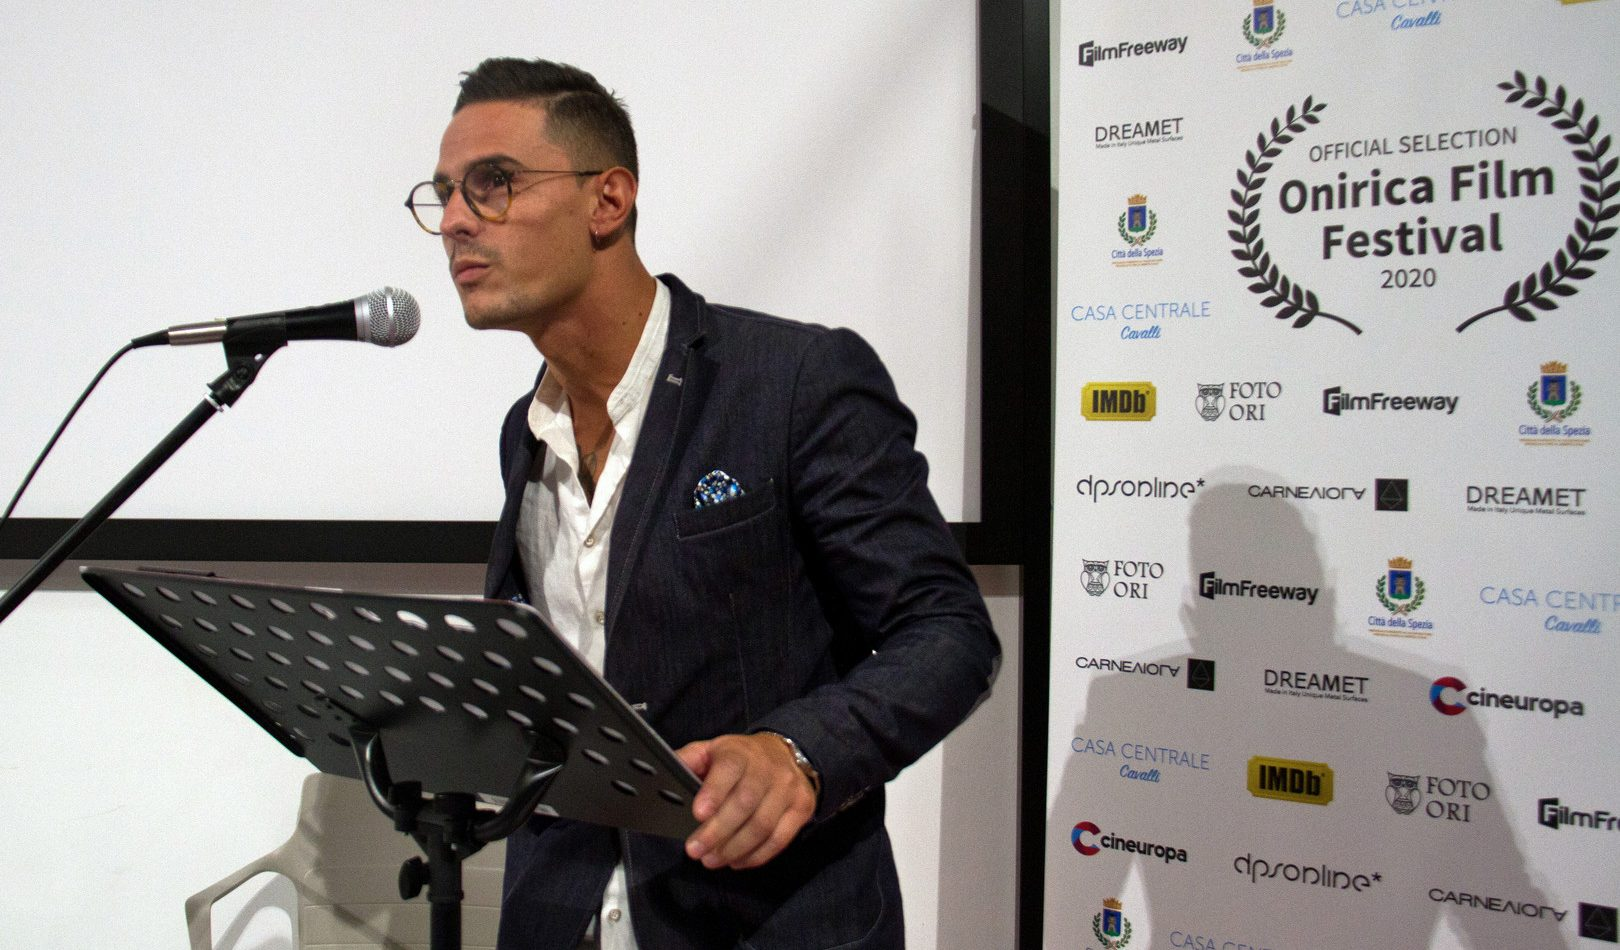 Onirica, About us, Alessio Bonini